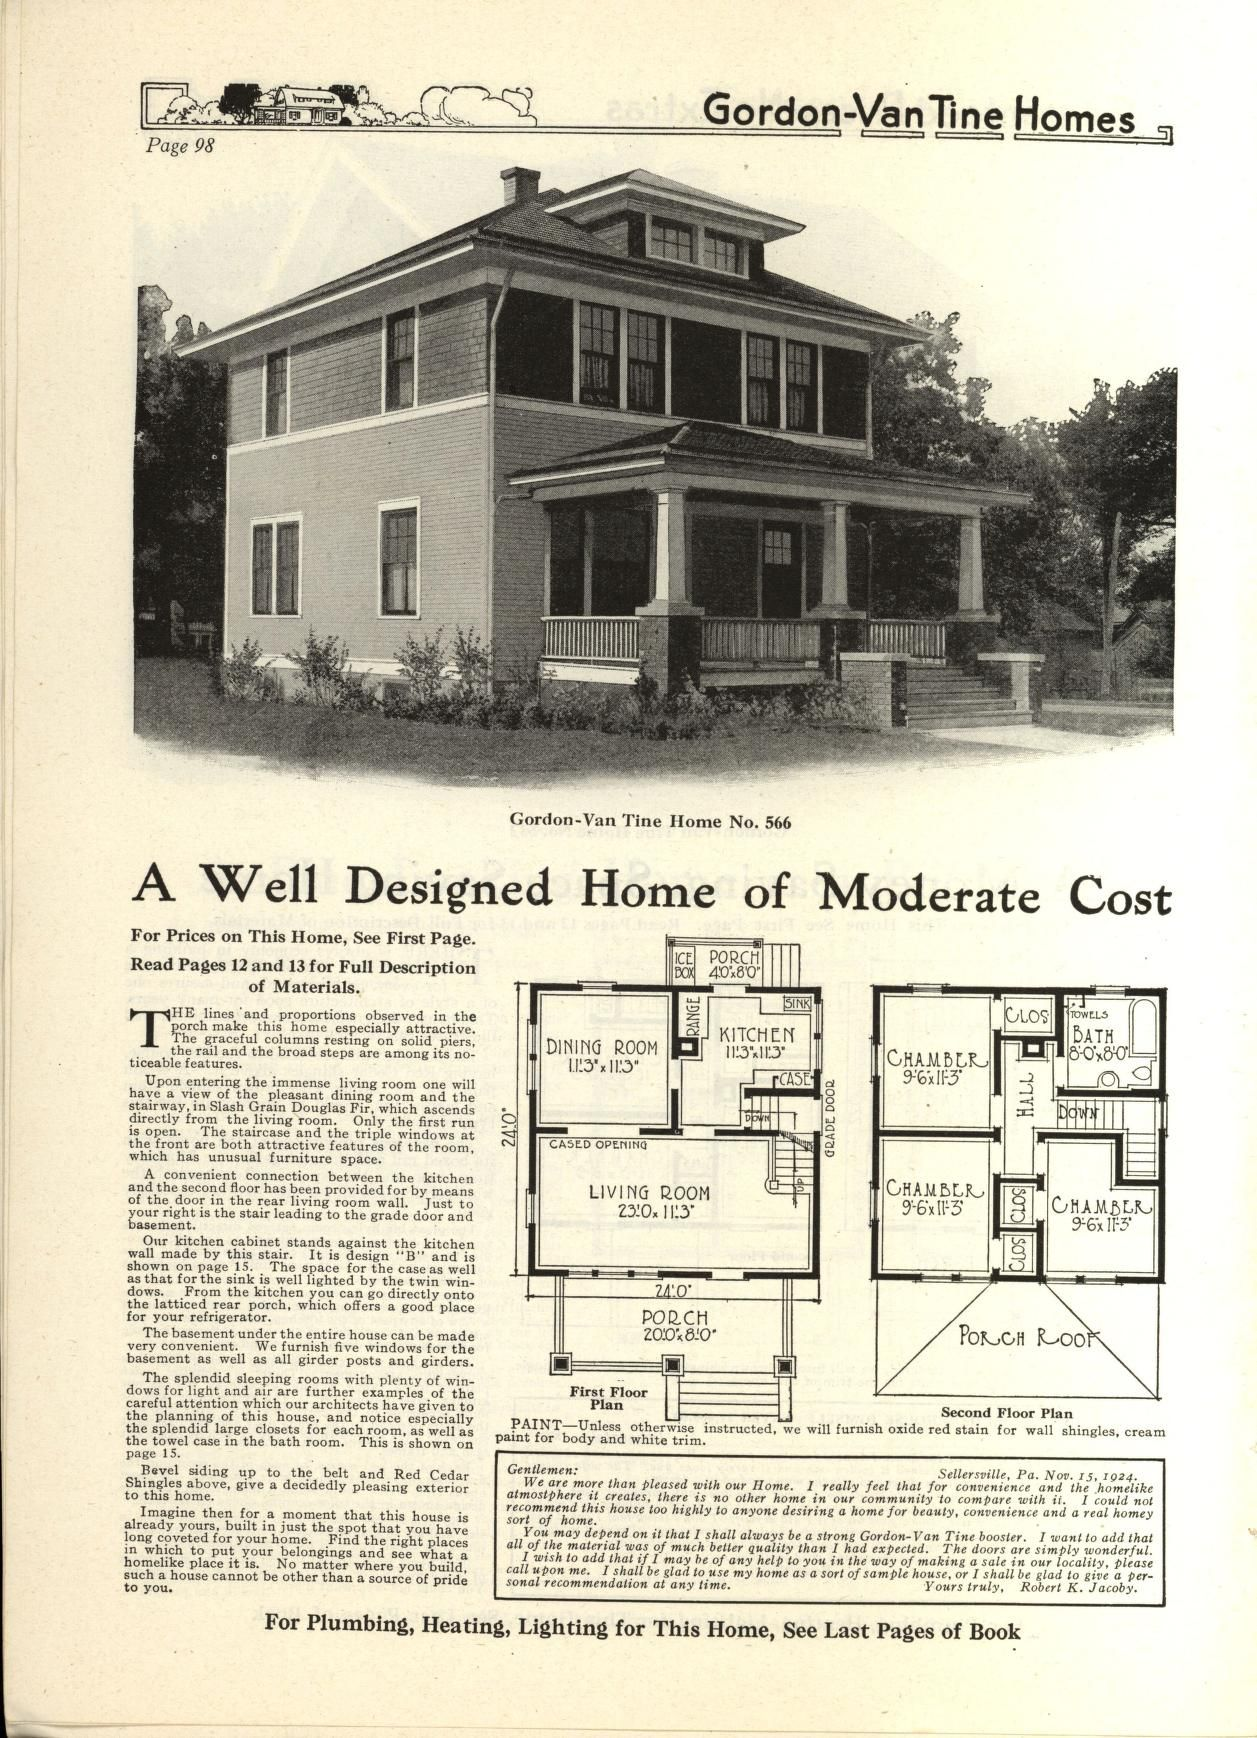 Gordon Van Tine Homes Gordon Van Tine Company Free Download Borrow And Streaming Internet Archive Square House Plans Vintage House Plans Four Square Homes